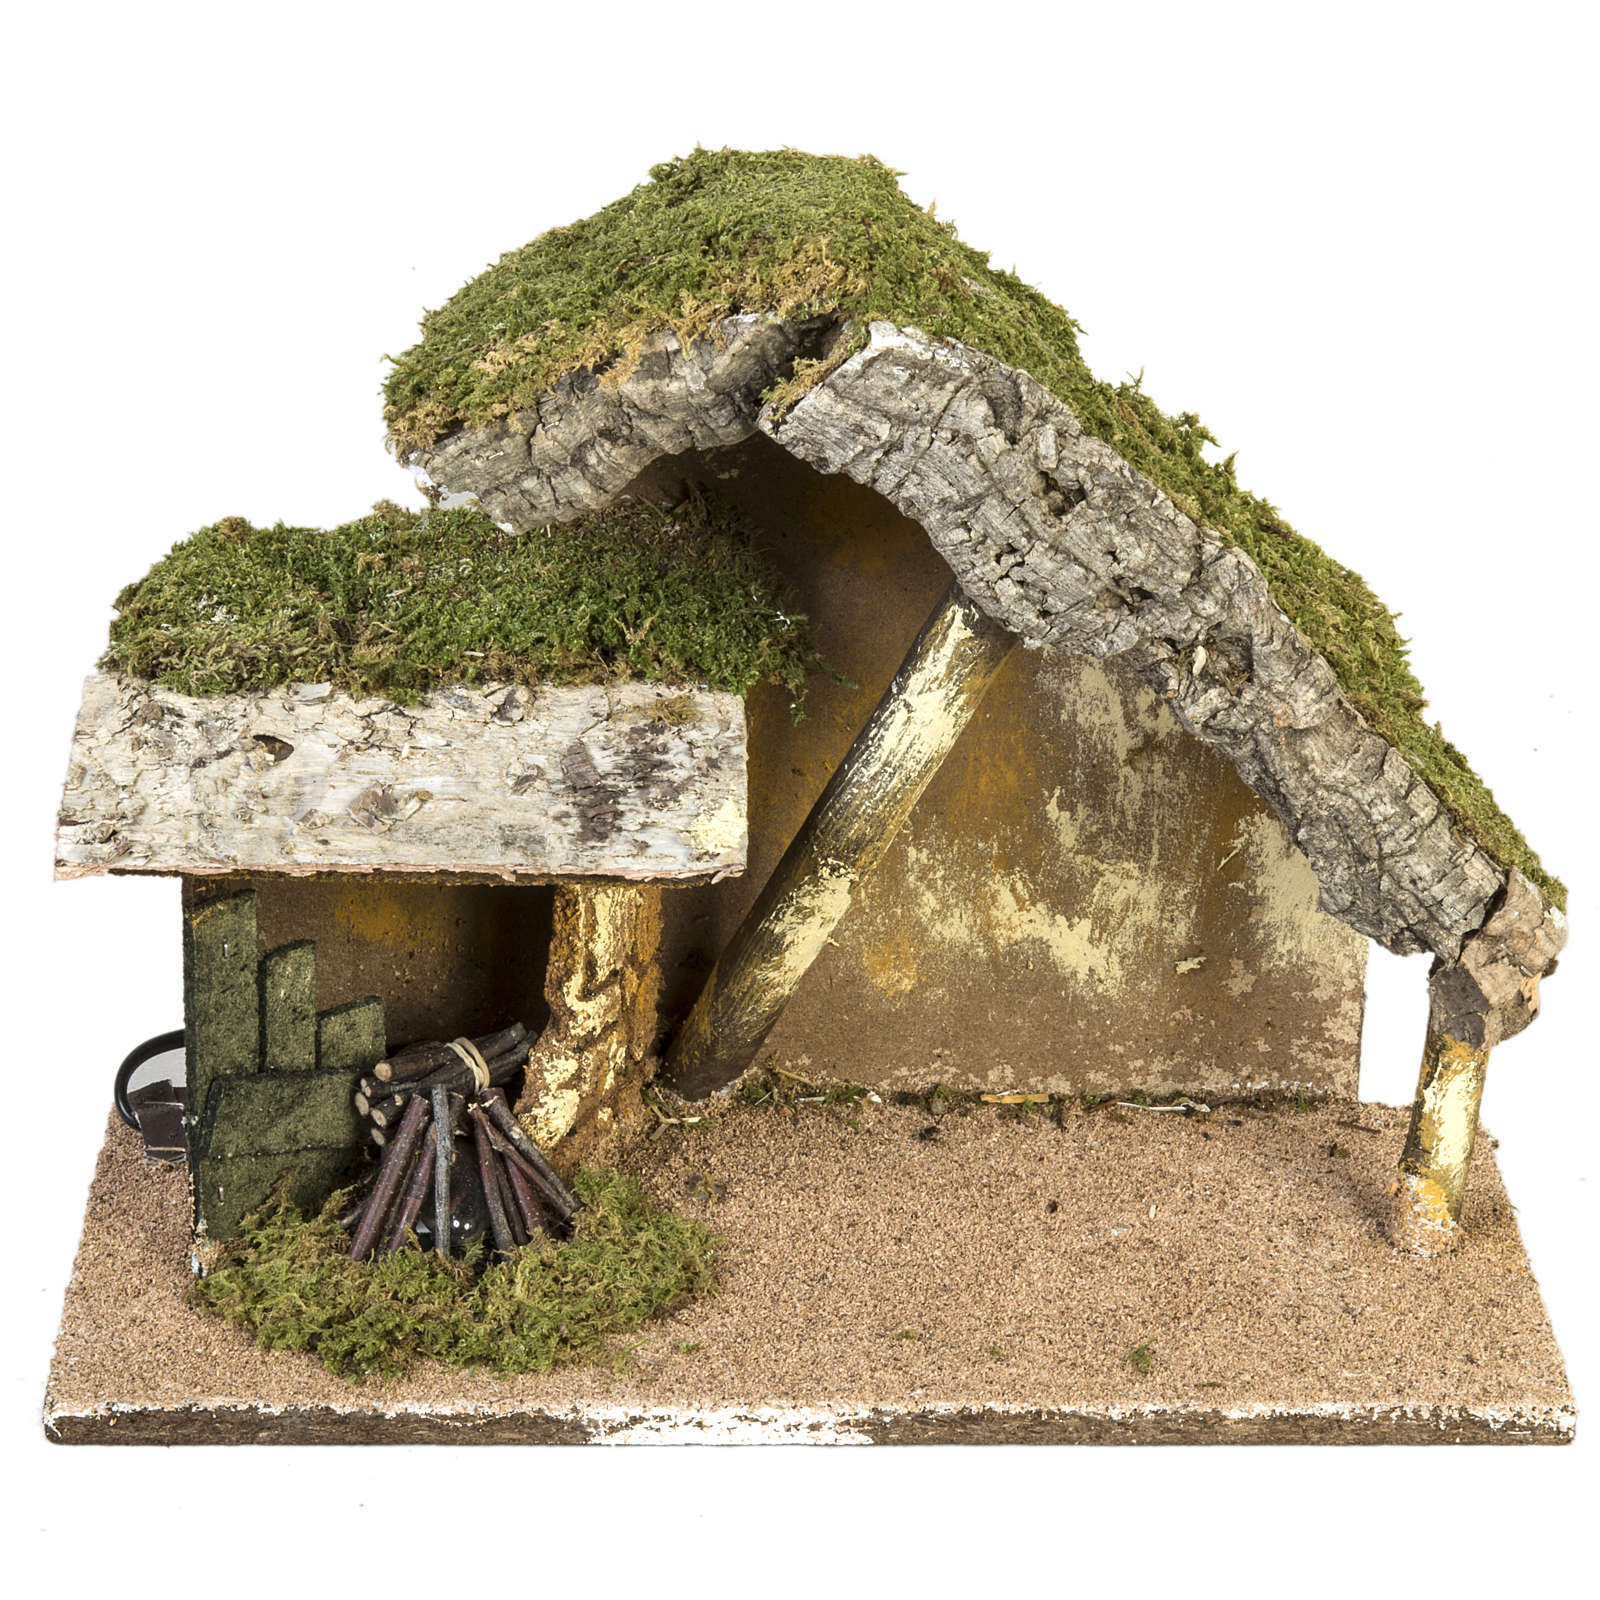 Capanna presepe tettoia e fuoco 26x36x16 cm 4